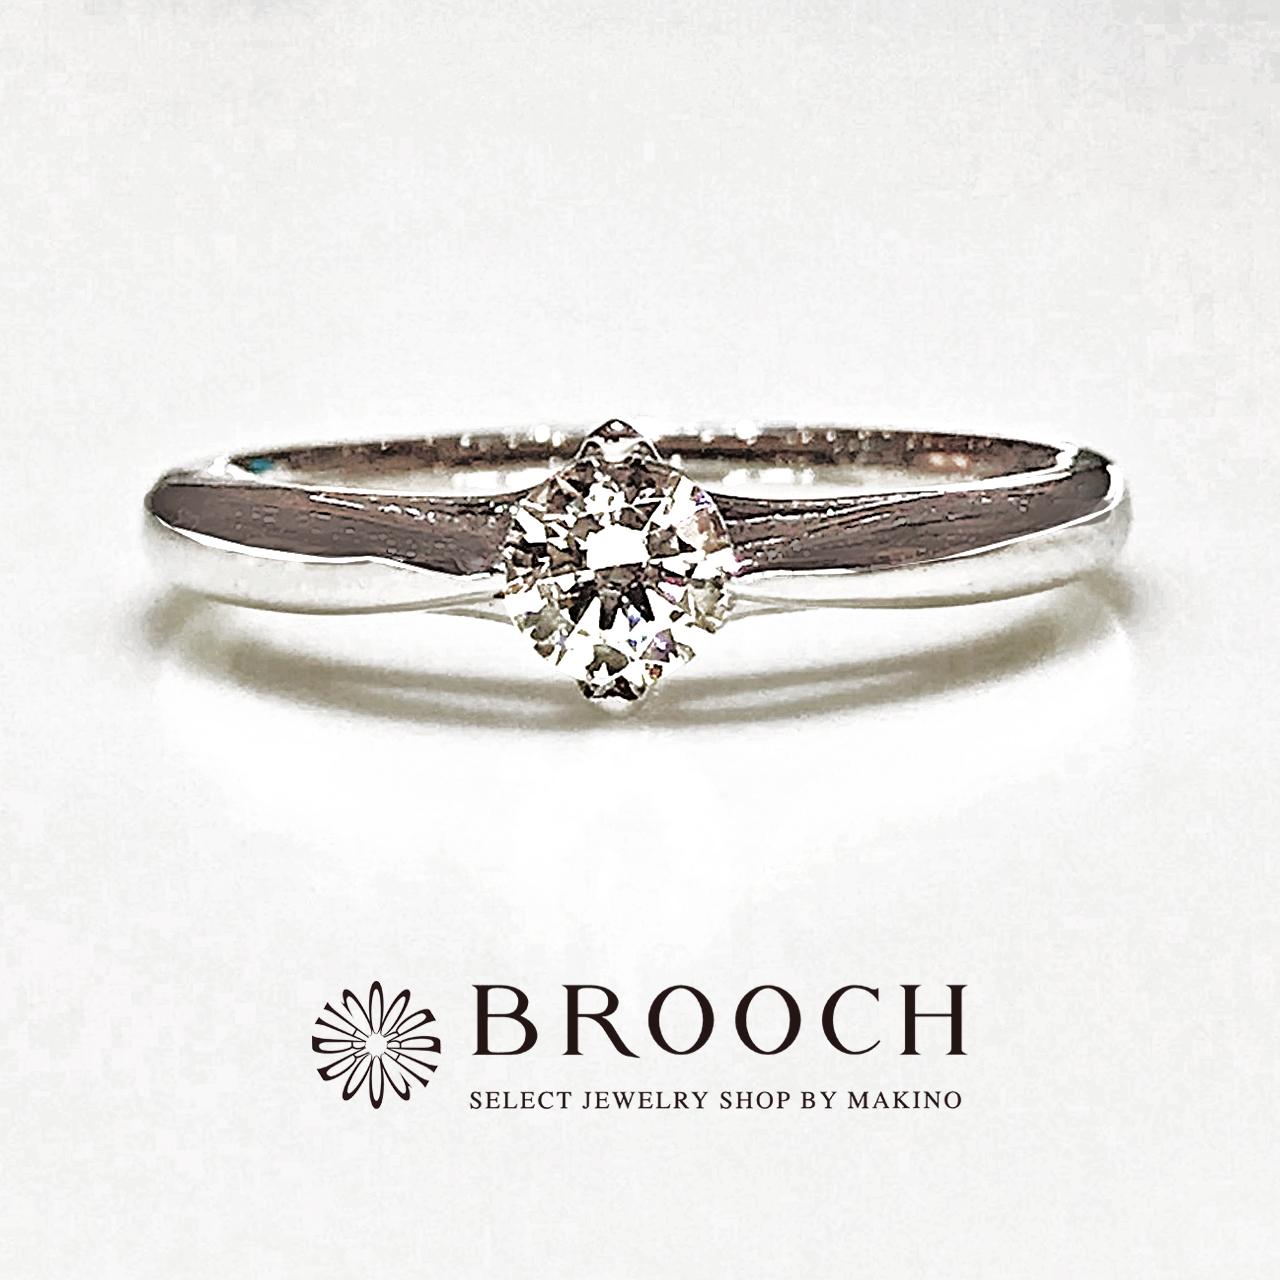 BROOCH 婚約指輪 エンゲージリング シンプルストレートデザイン